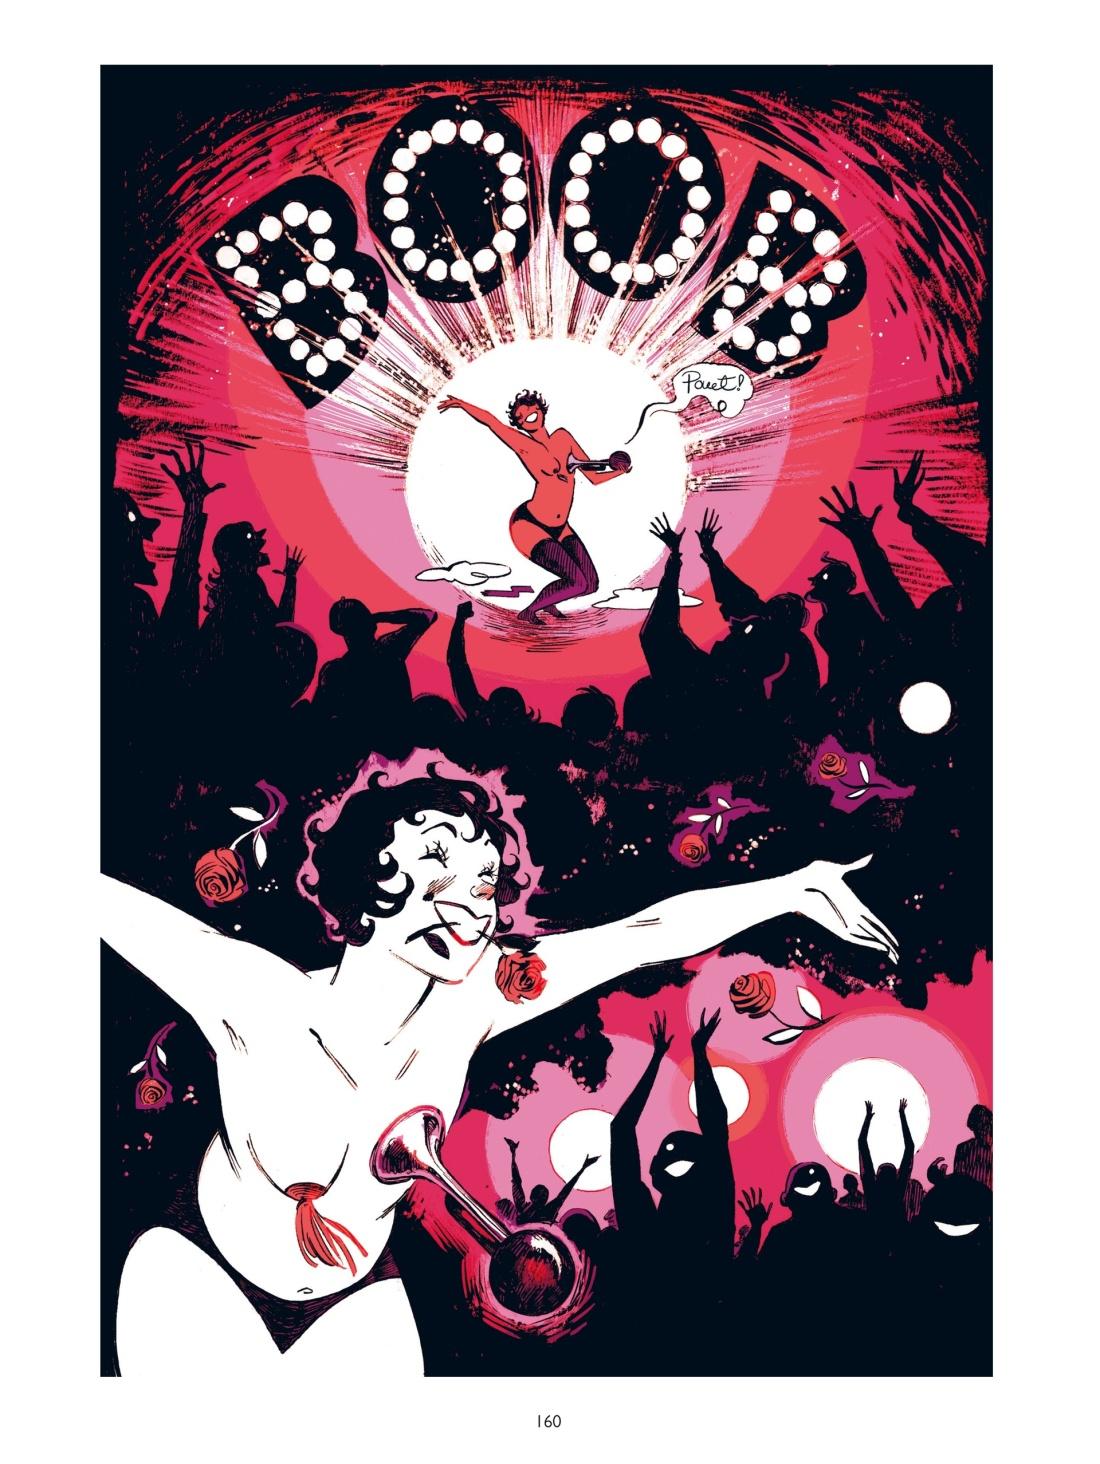 Betty Boob - burlesk